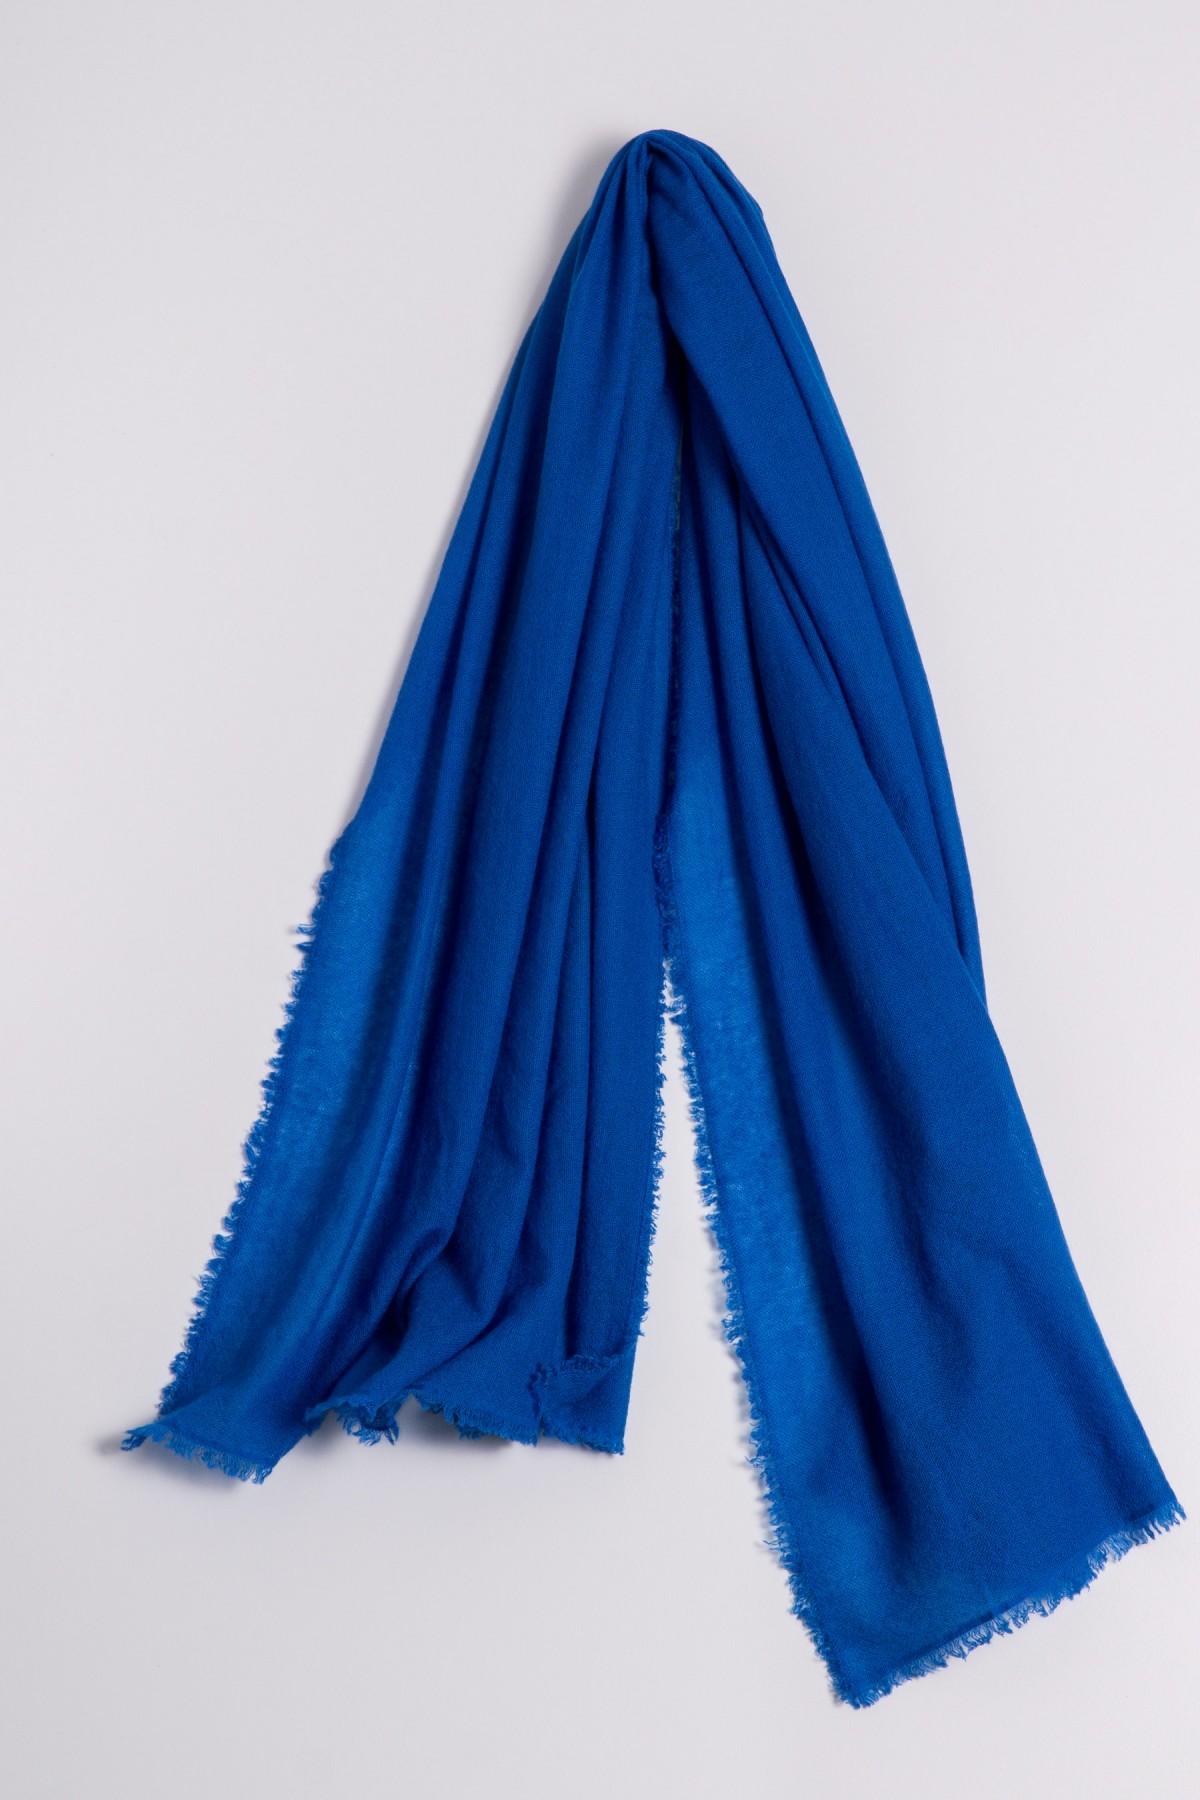 Kyōto Pashmina snorkel blue